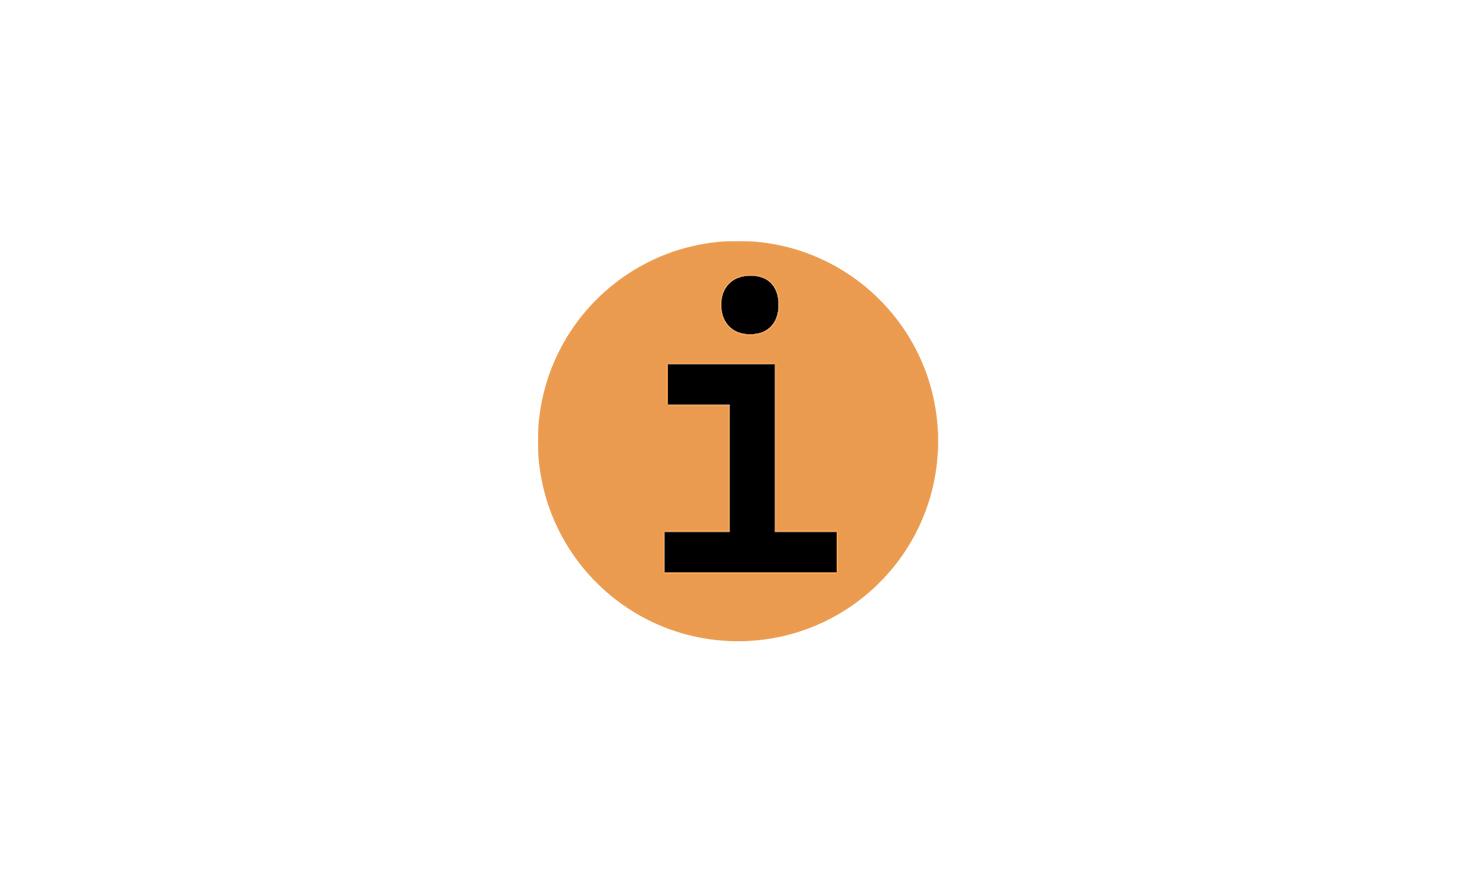 https://kubelibre.com/uploads/Slider-work-tutti-clienti/ivrea-e-unesco-città-industriale-del-xx-secolo-logo.jpg